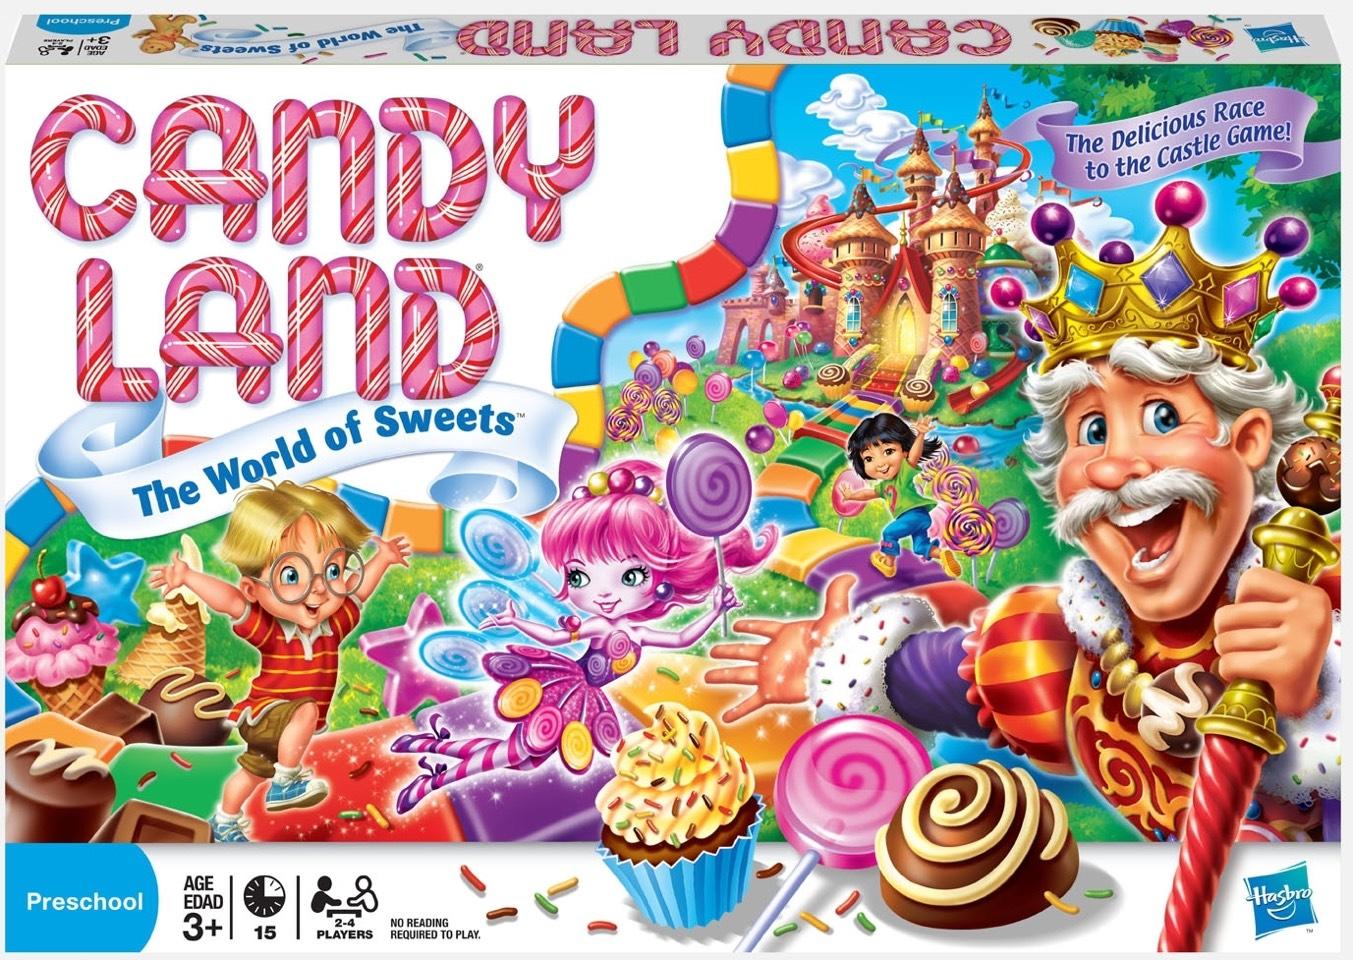 3.) candy land!